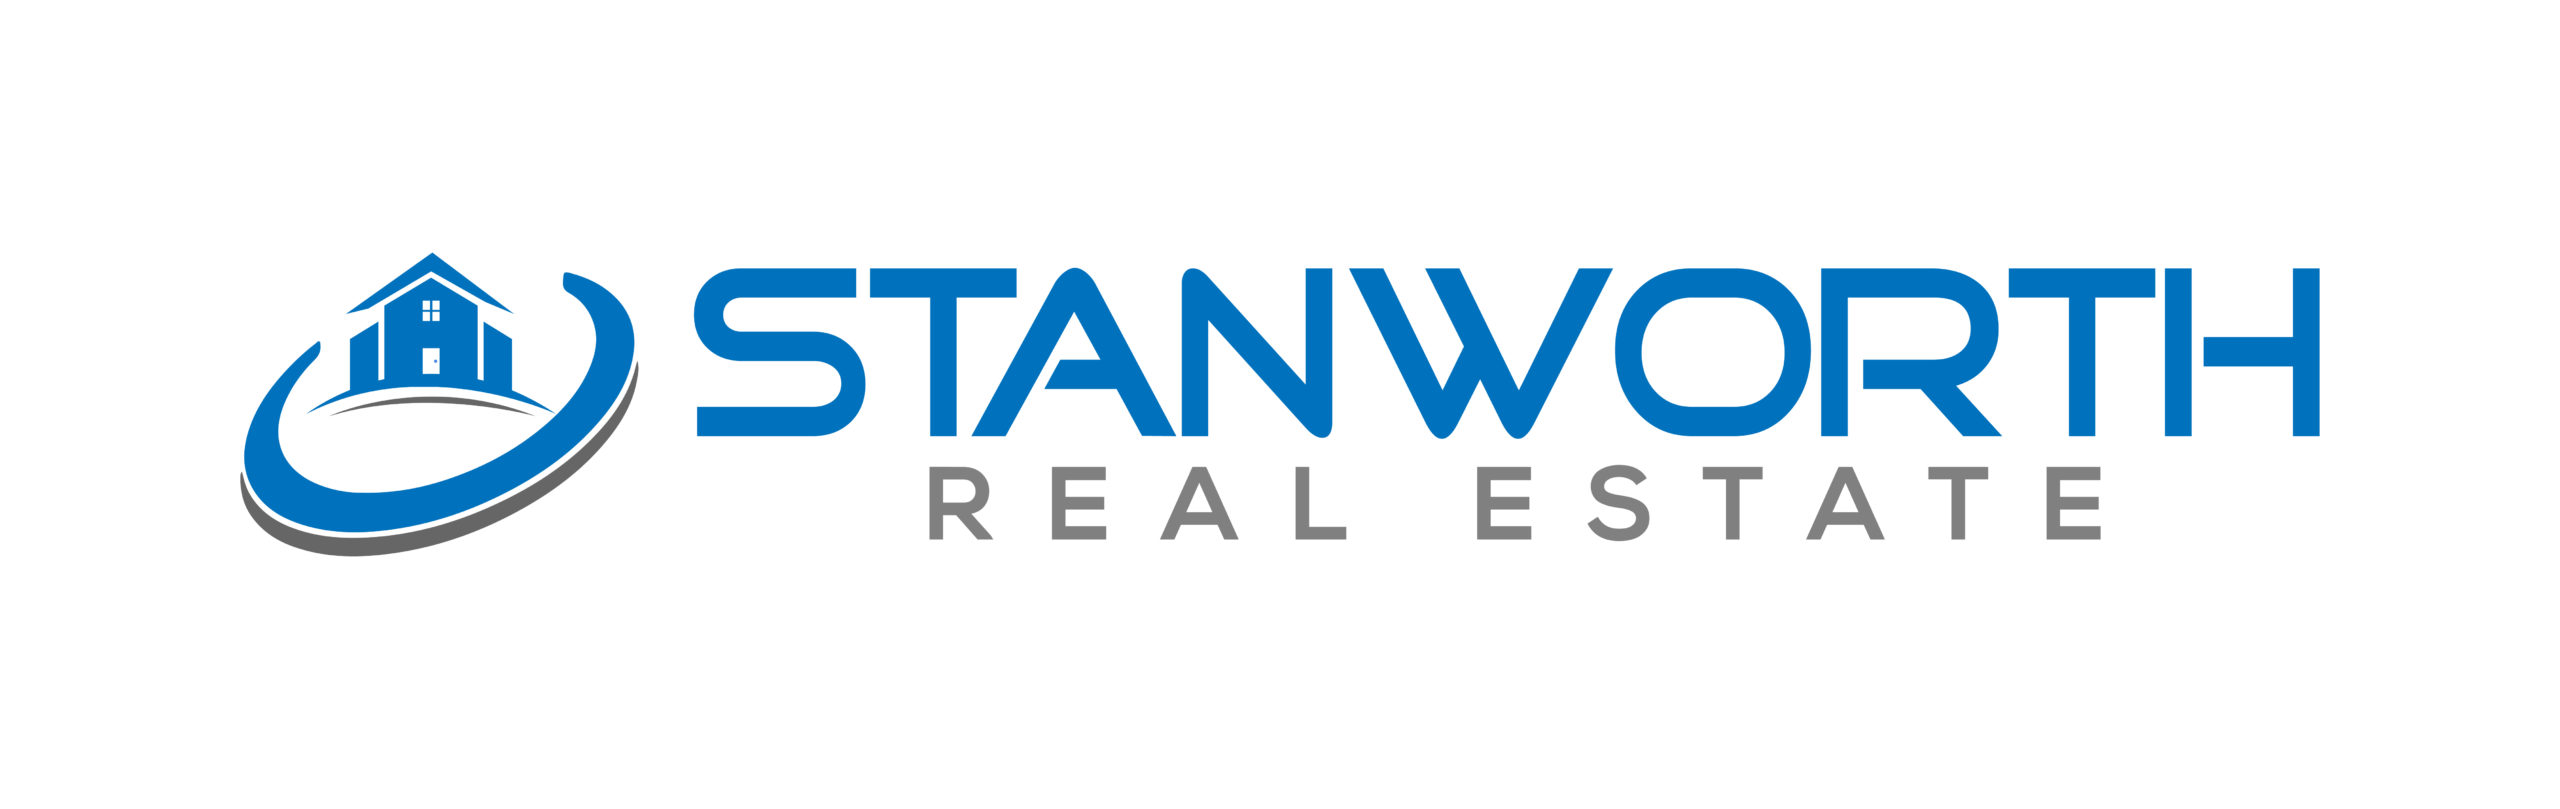 Stanworth Real Estate Logo